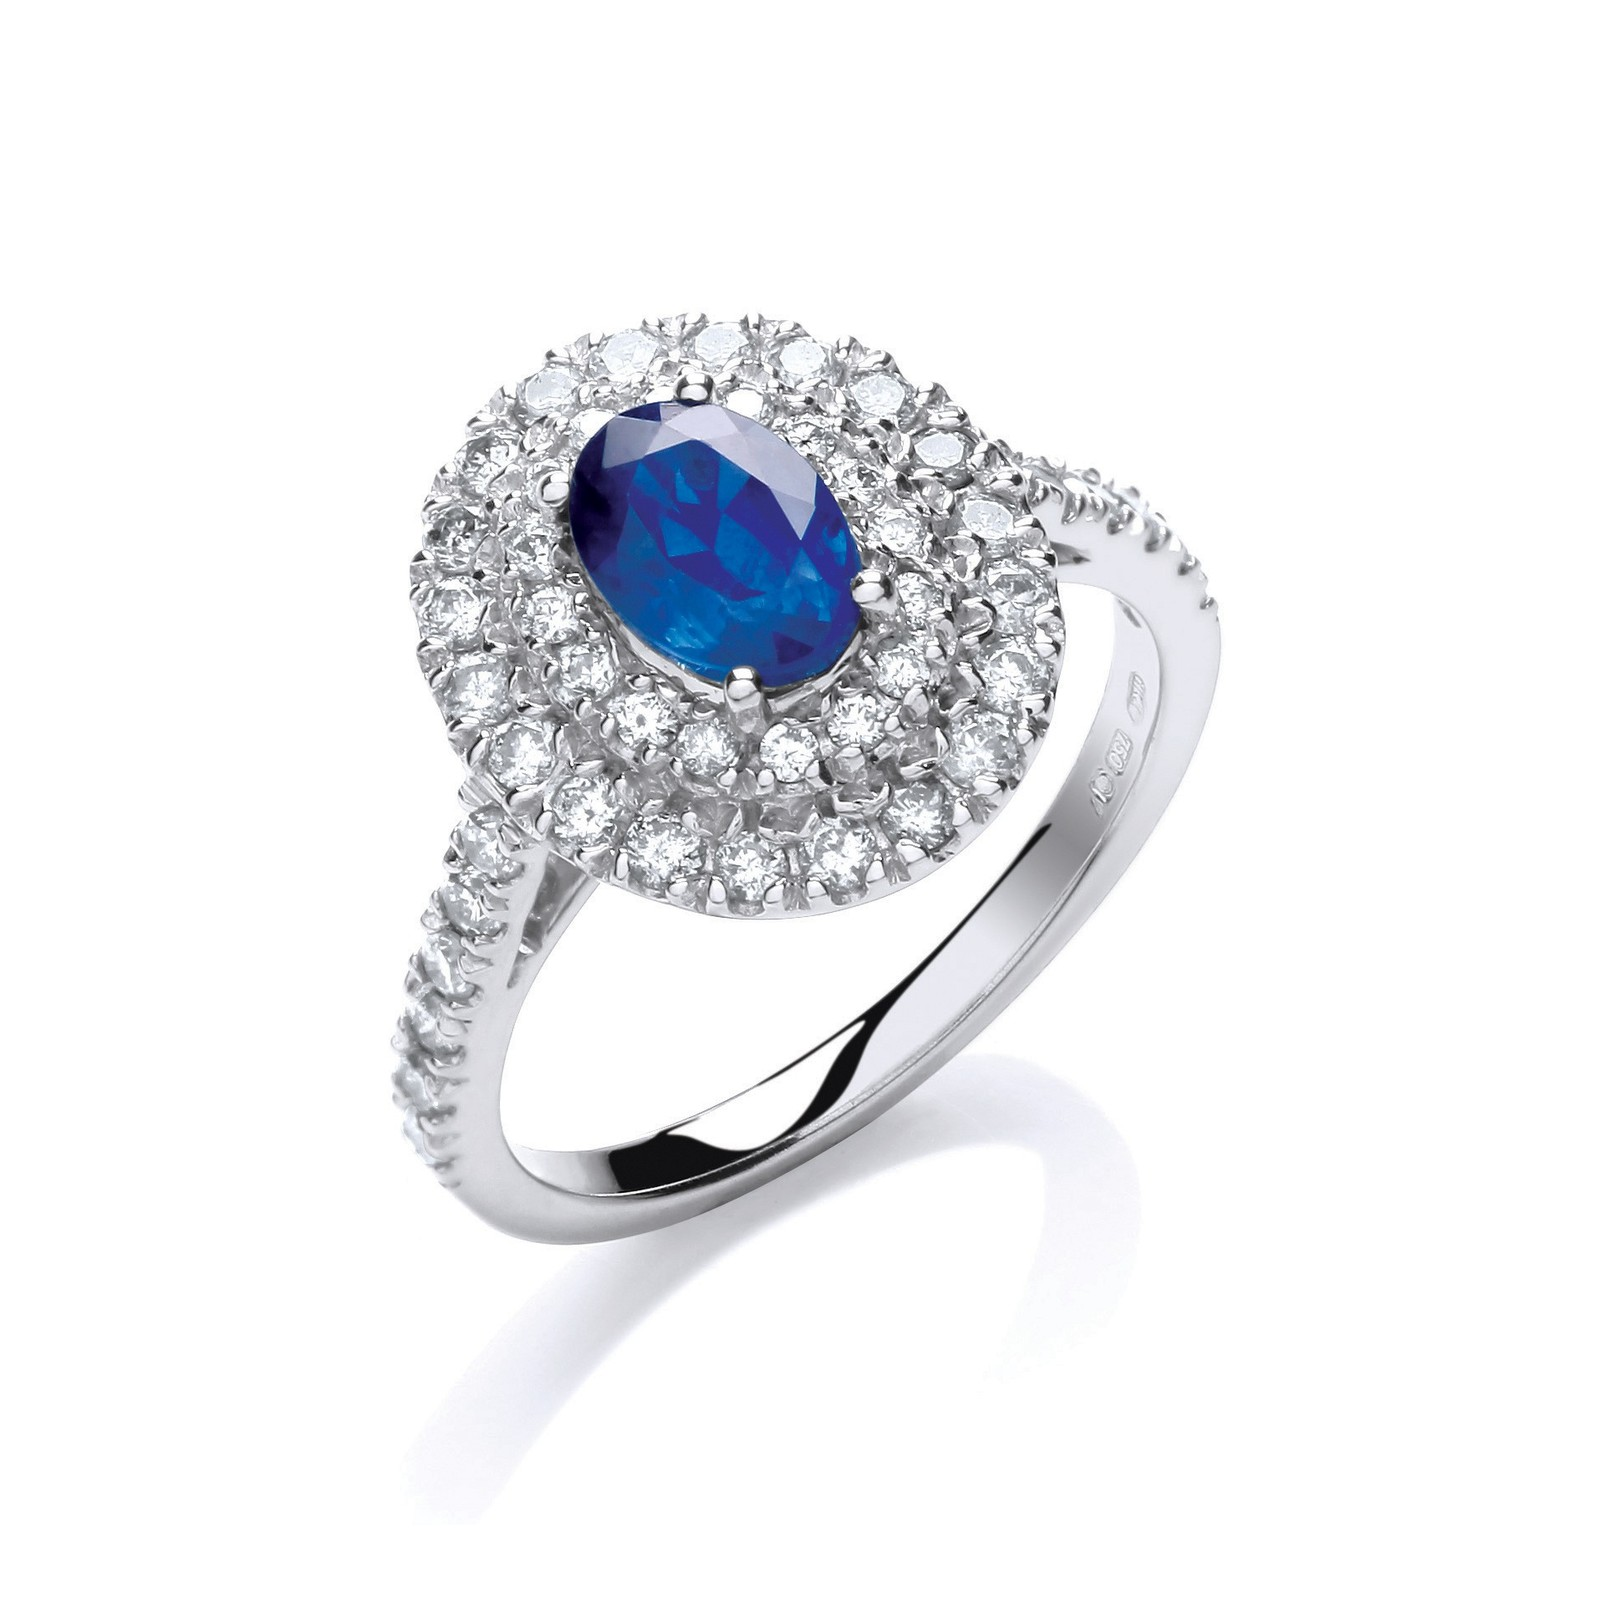 18ct W/G Diamond 0.60ct, Oval 1.0ct Sapphire Ring